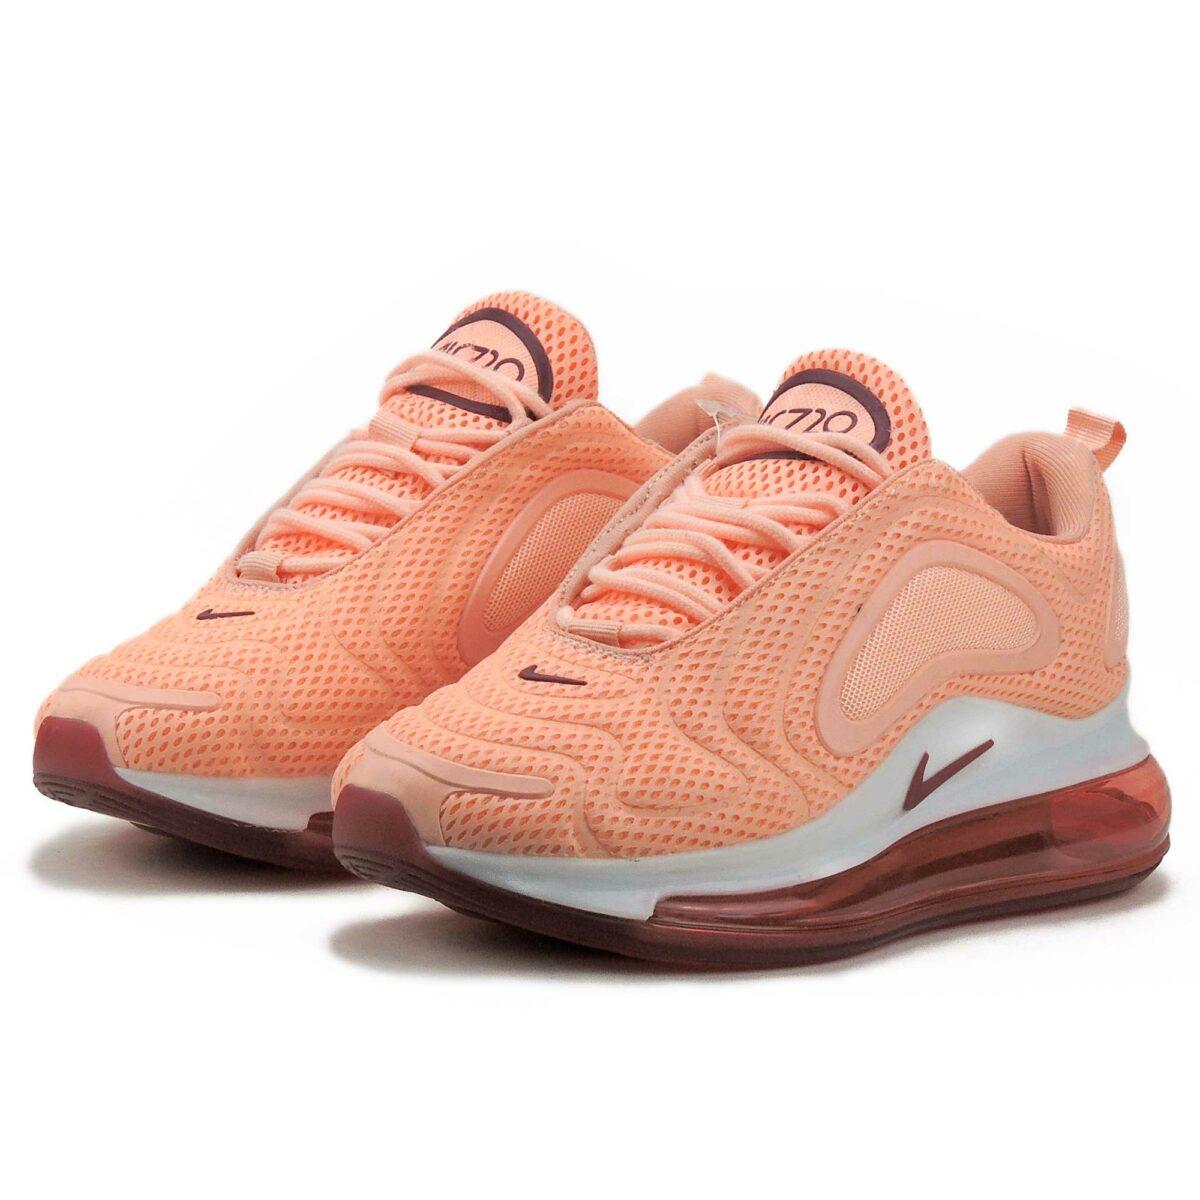 nike air max 720 pink rose AO2924_063 купить